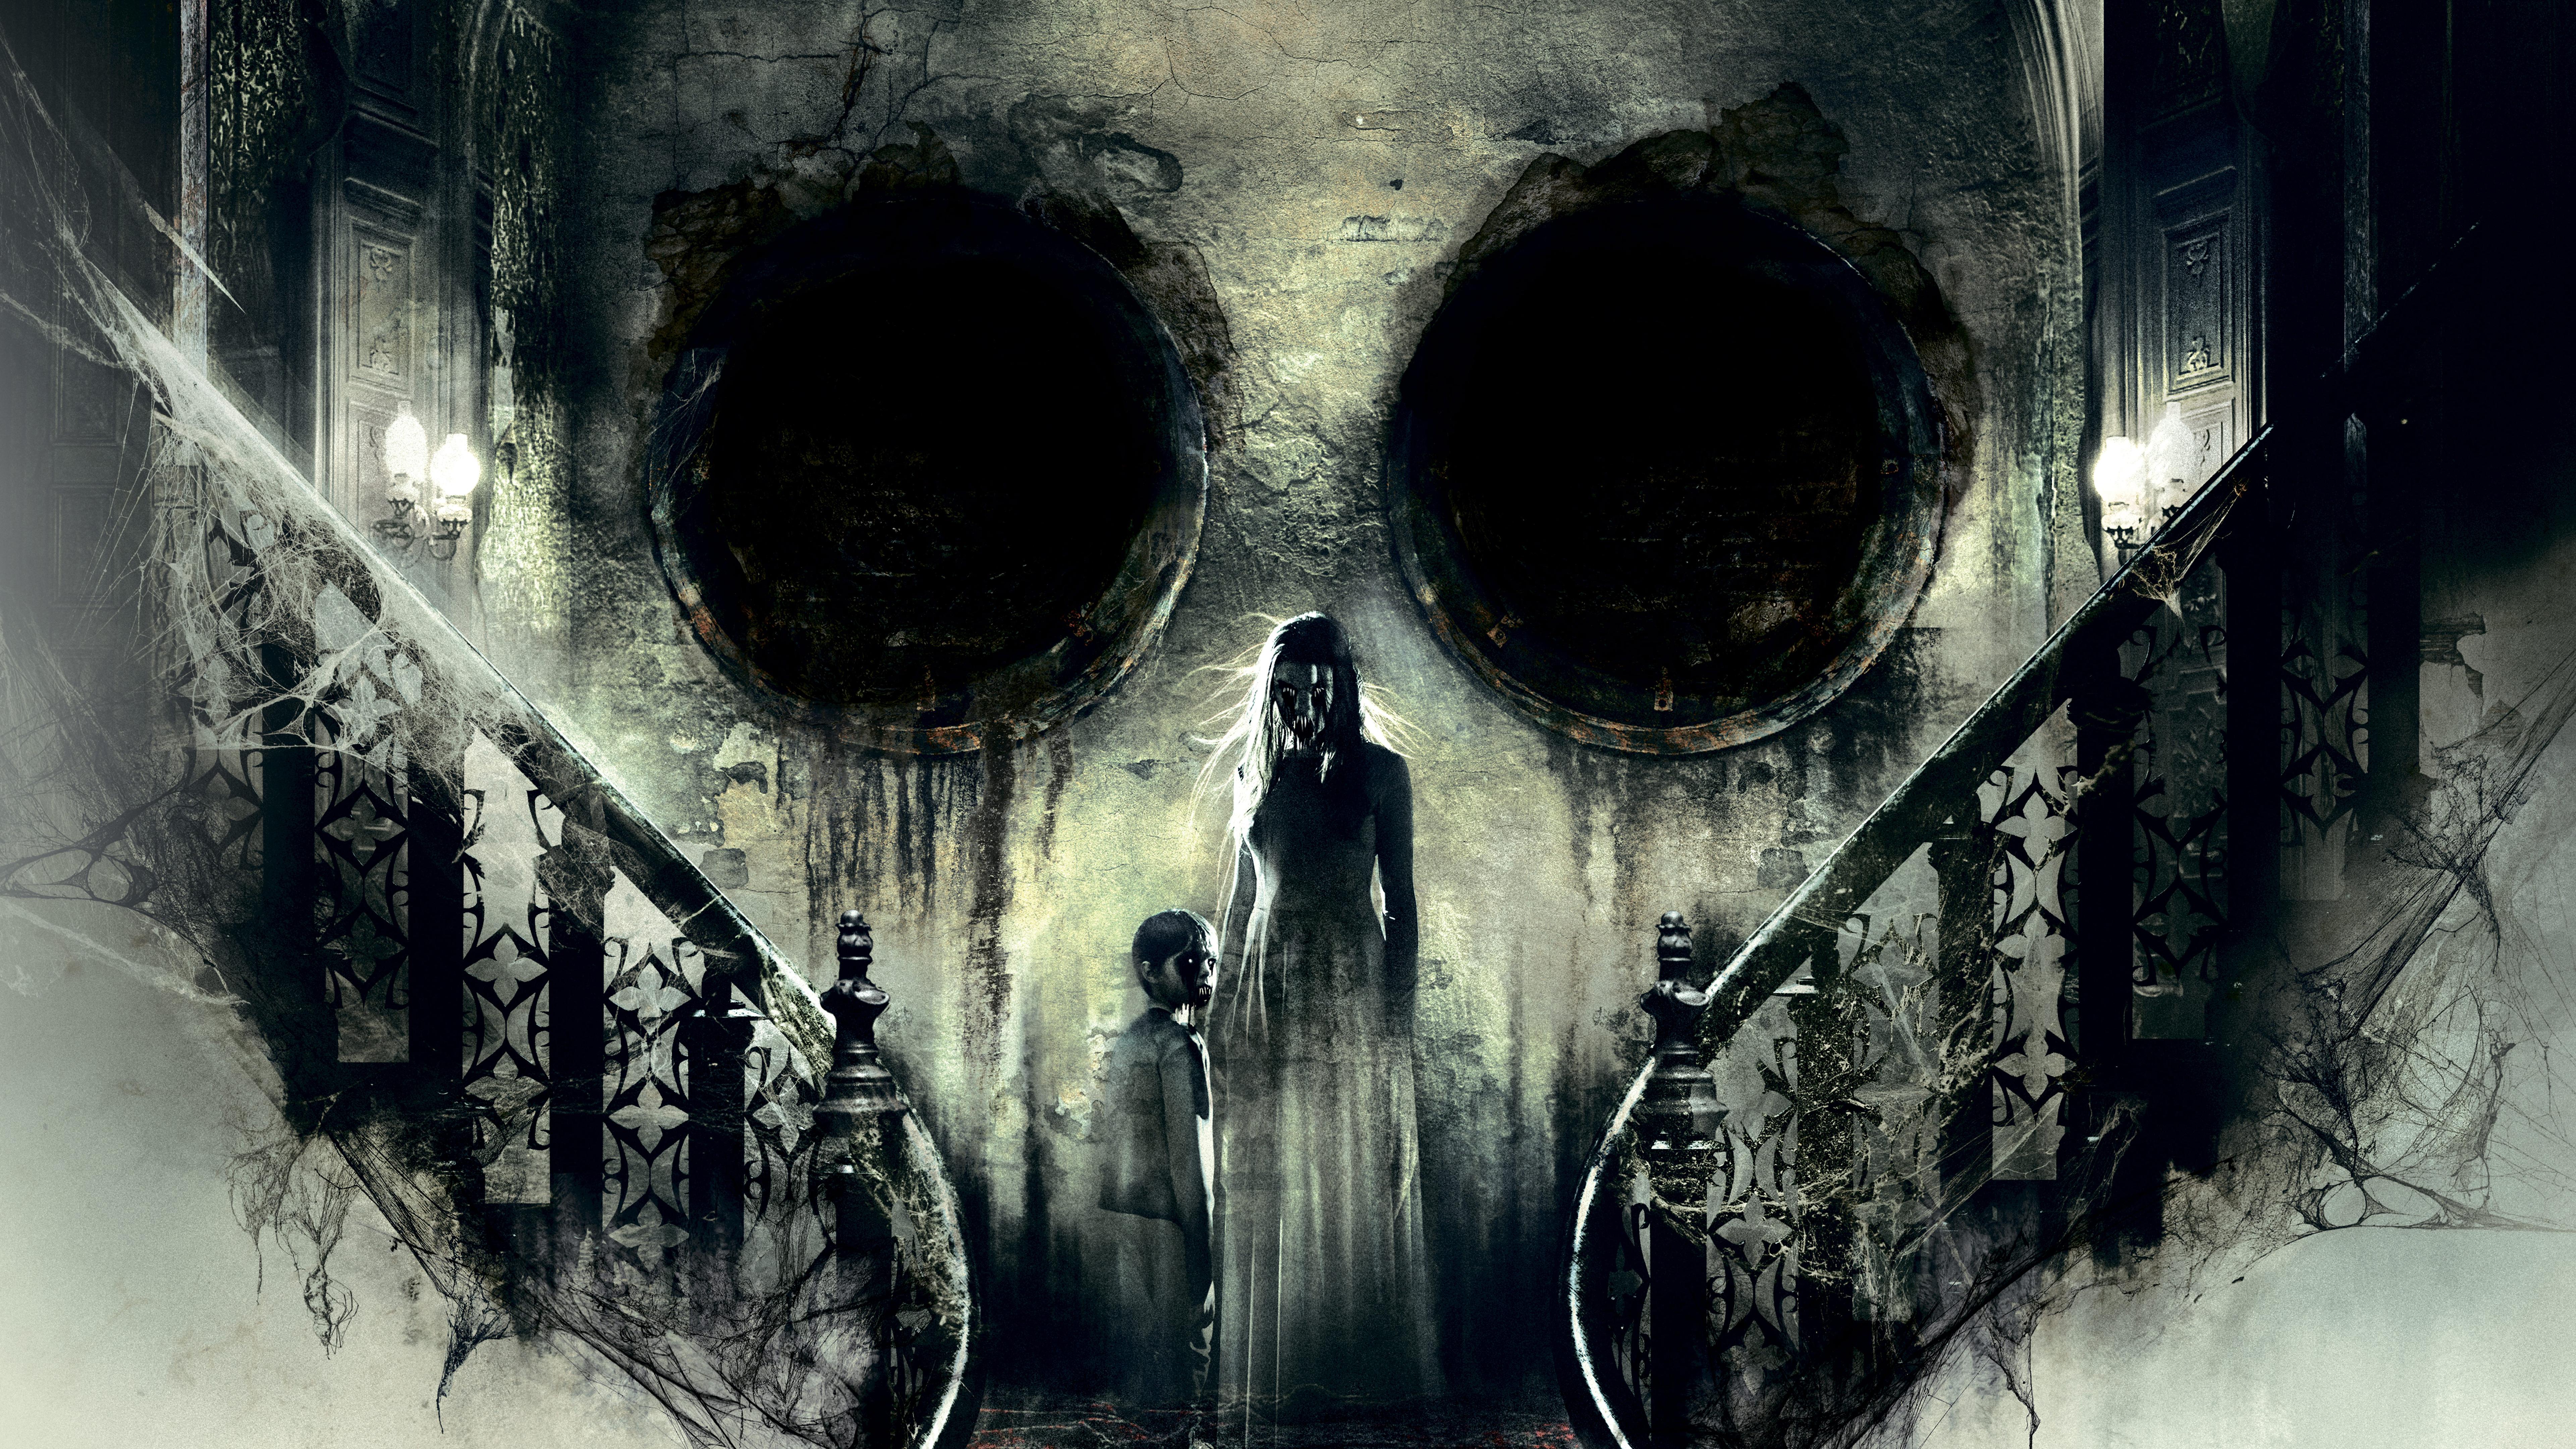 Guests Russian Horror Movie 4k 8k Hd Wallpapers Horror 4k